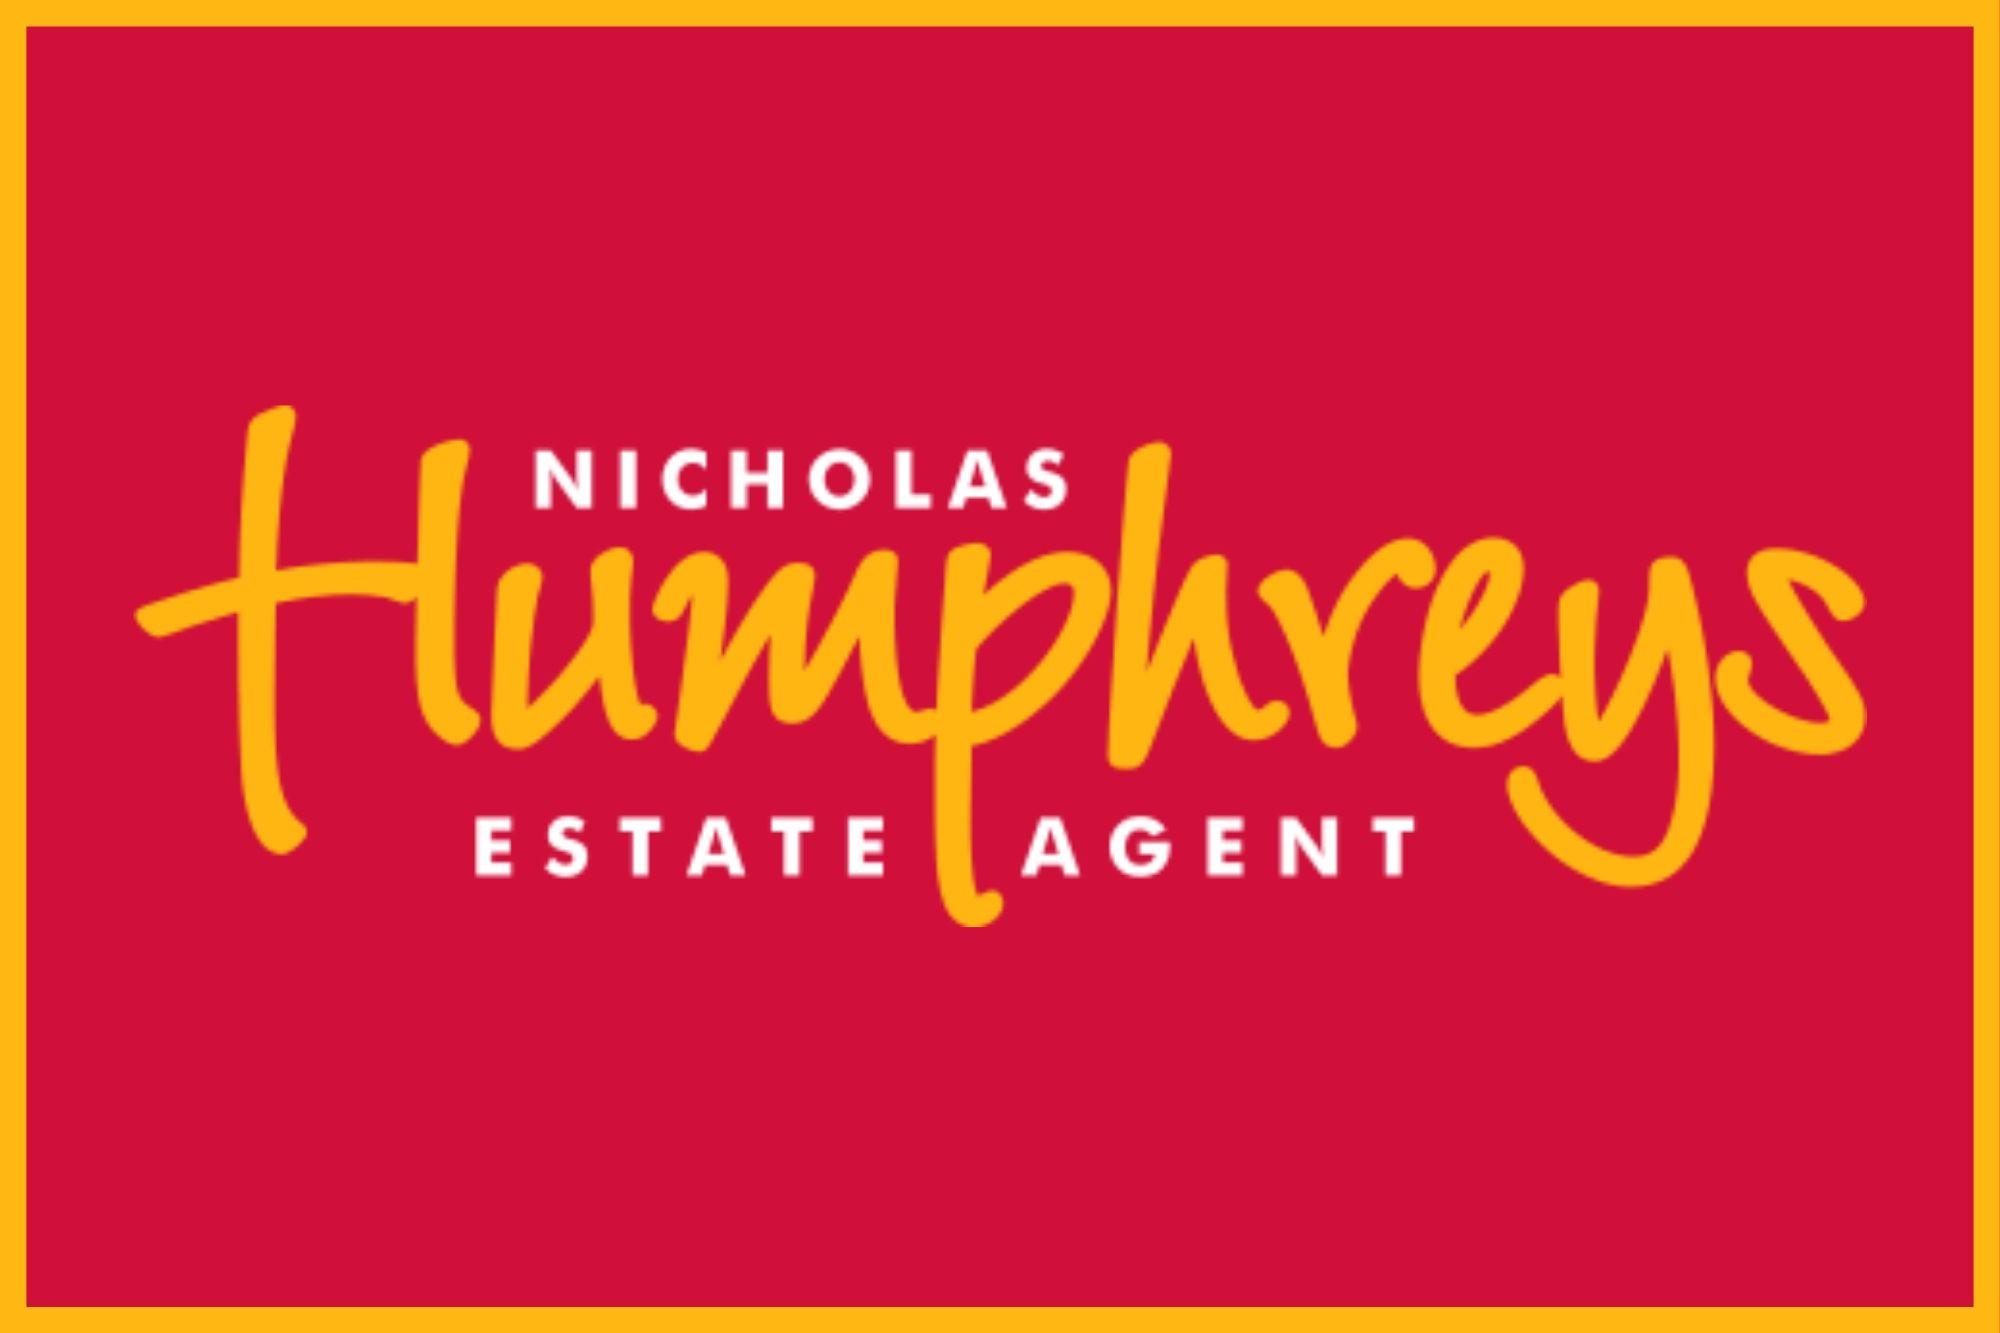 Nicholas Humphreys Estate and Letting Agency